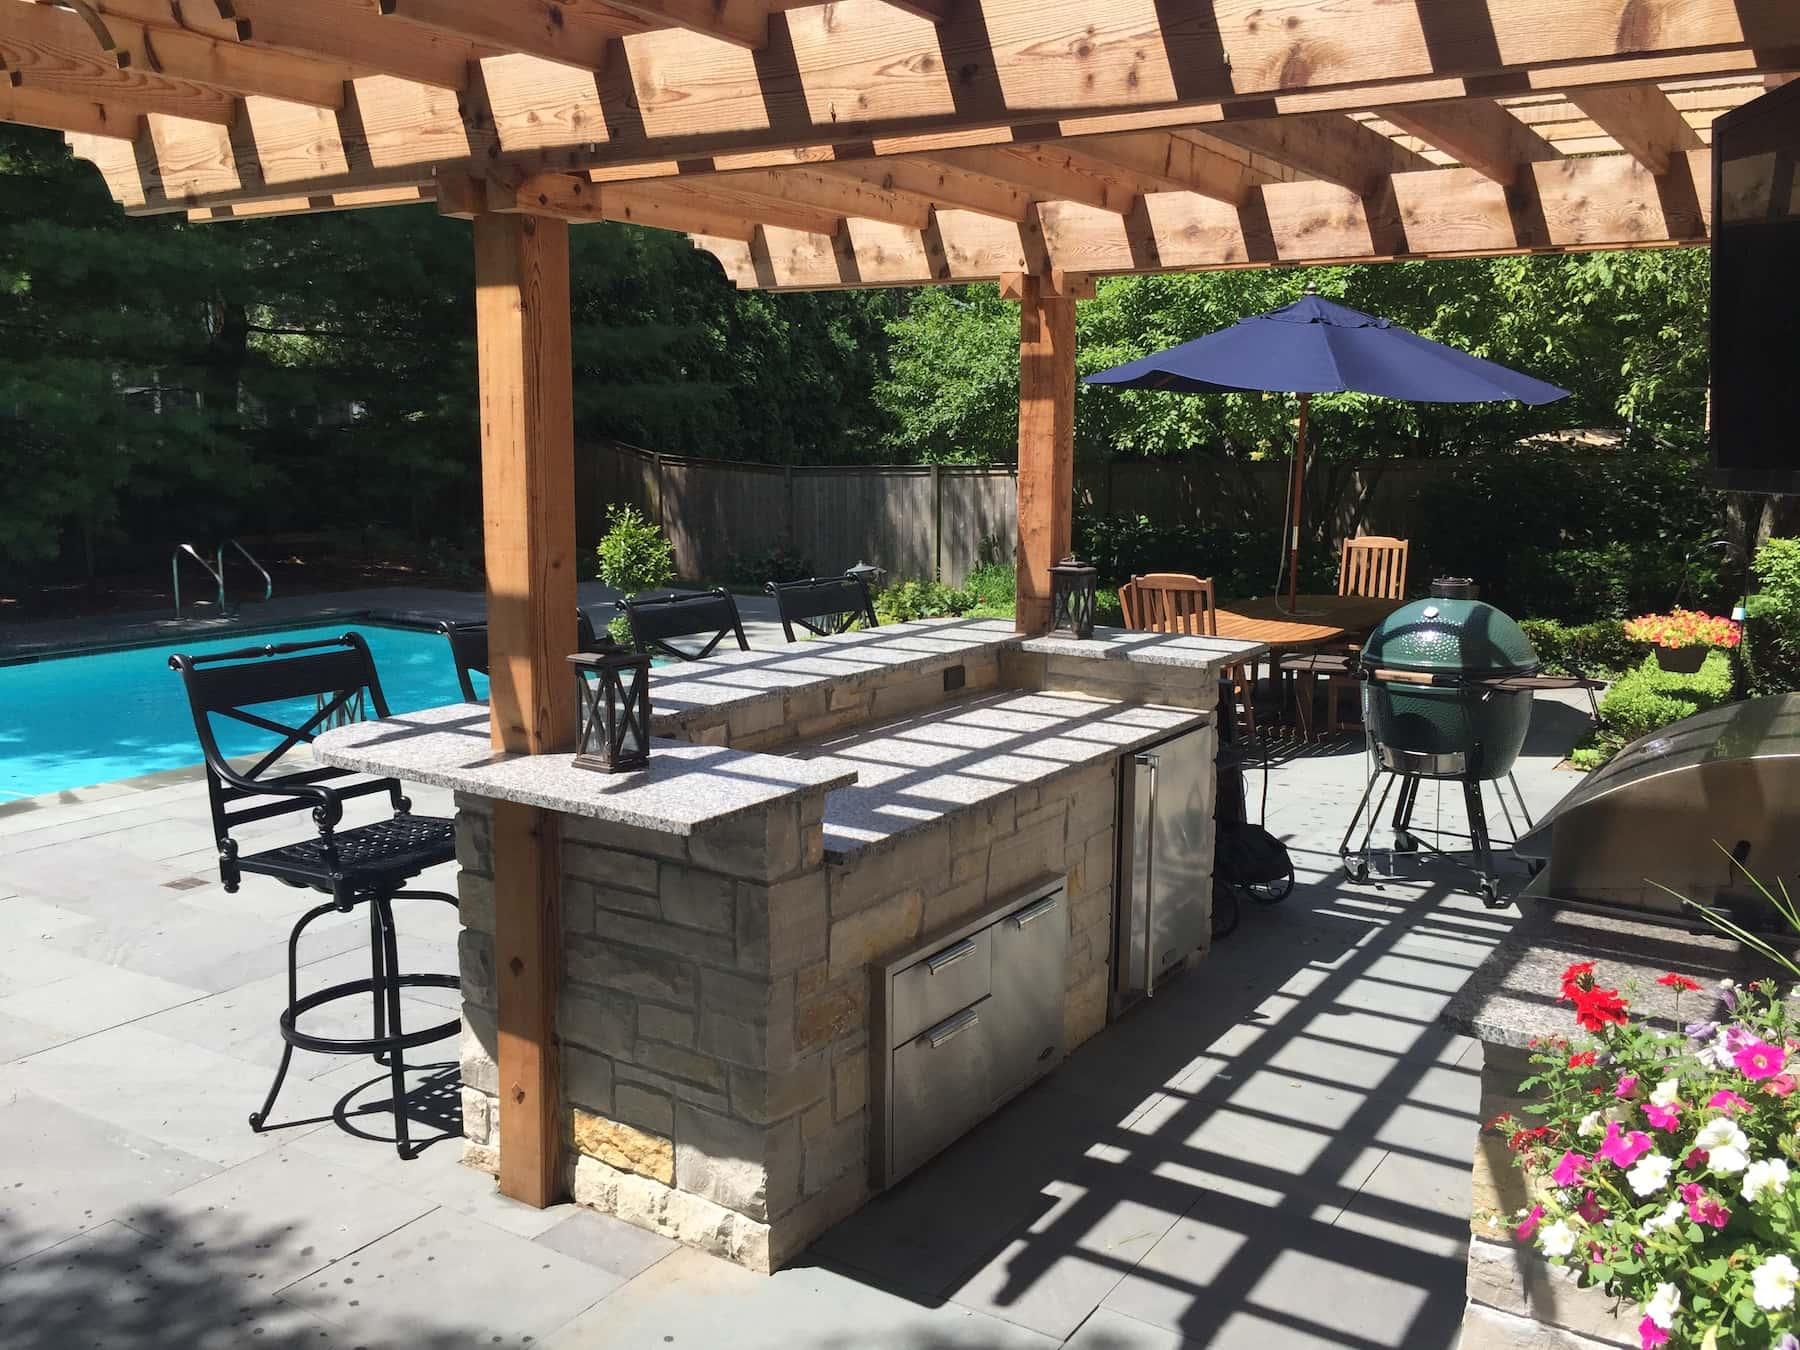 Pergola Outdoor Bar Stools Paver Patio Northbrook, IL